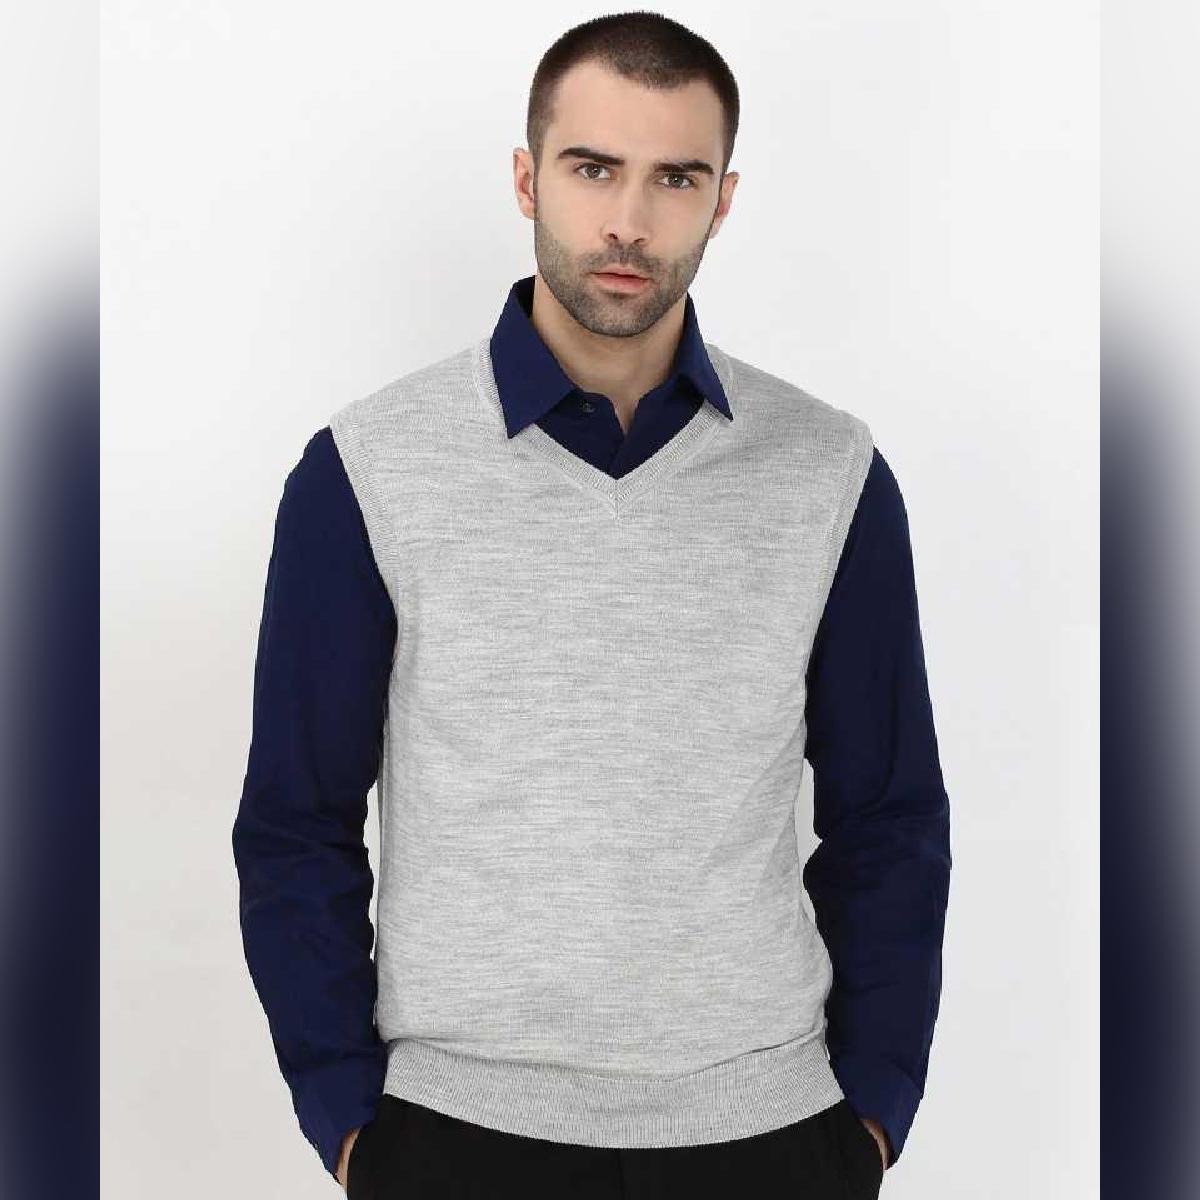 AL FAJAR Finest Wool Blend V-Neck Sleeveless Grey Casual Sweater For Men